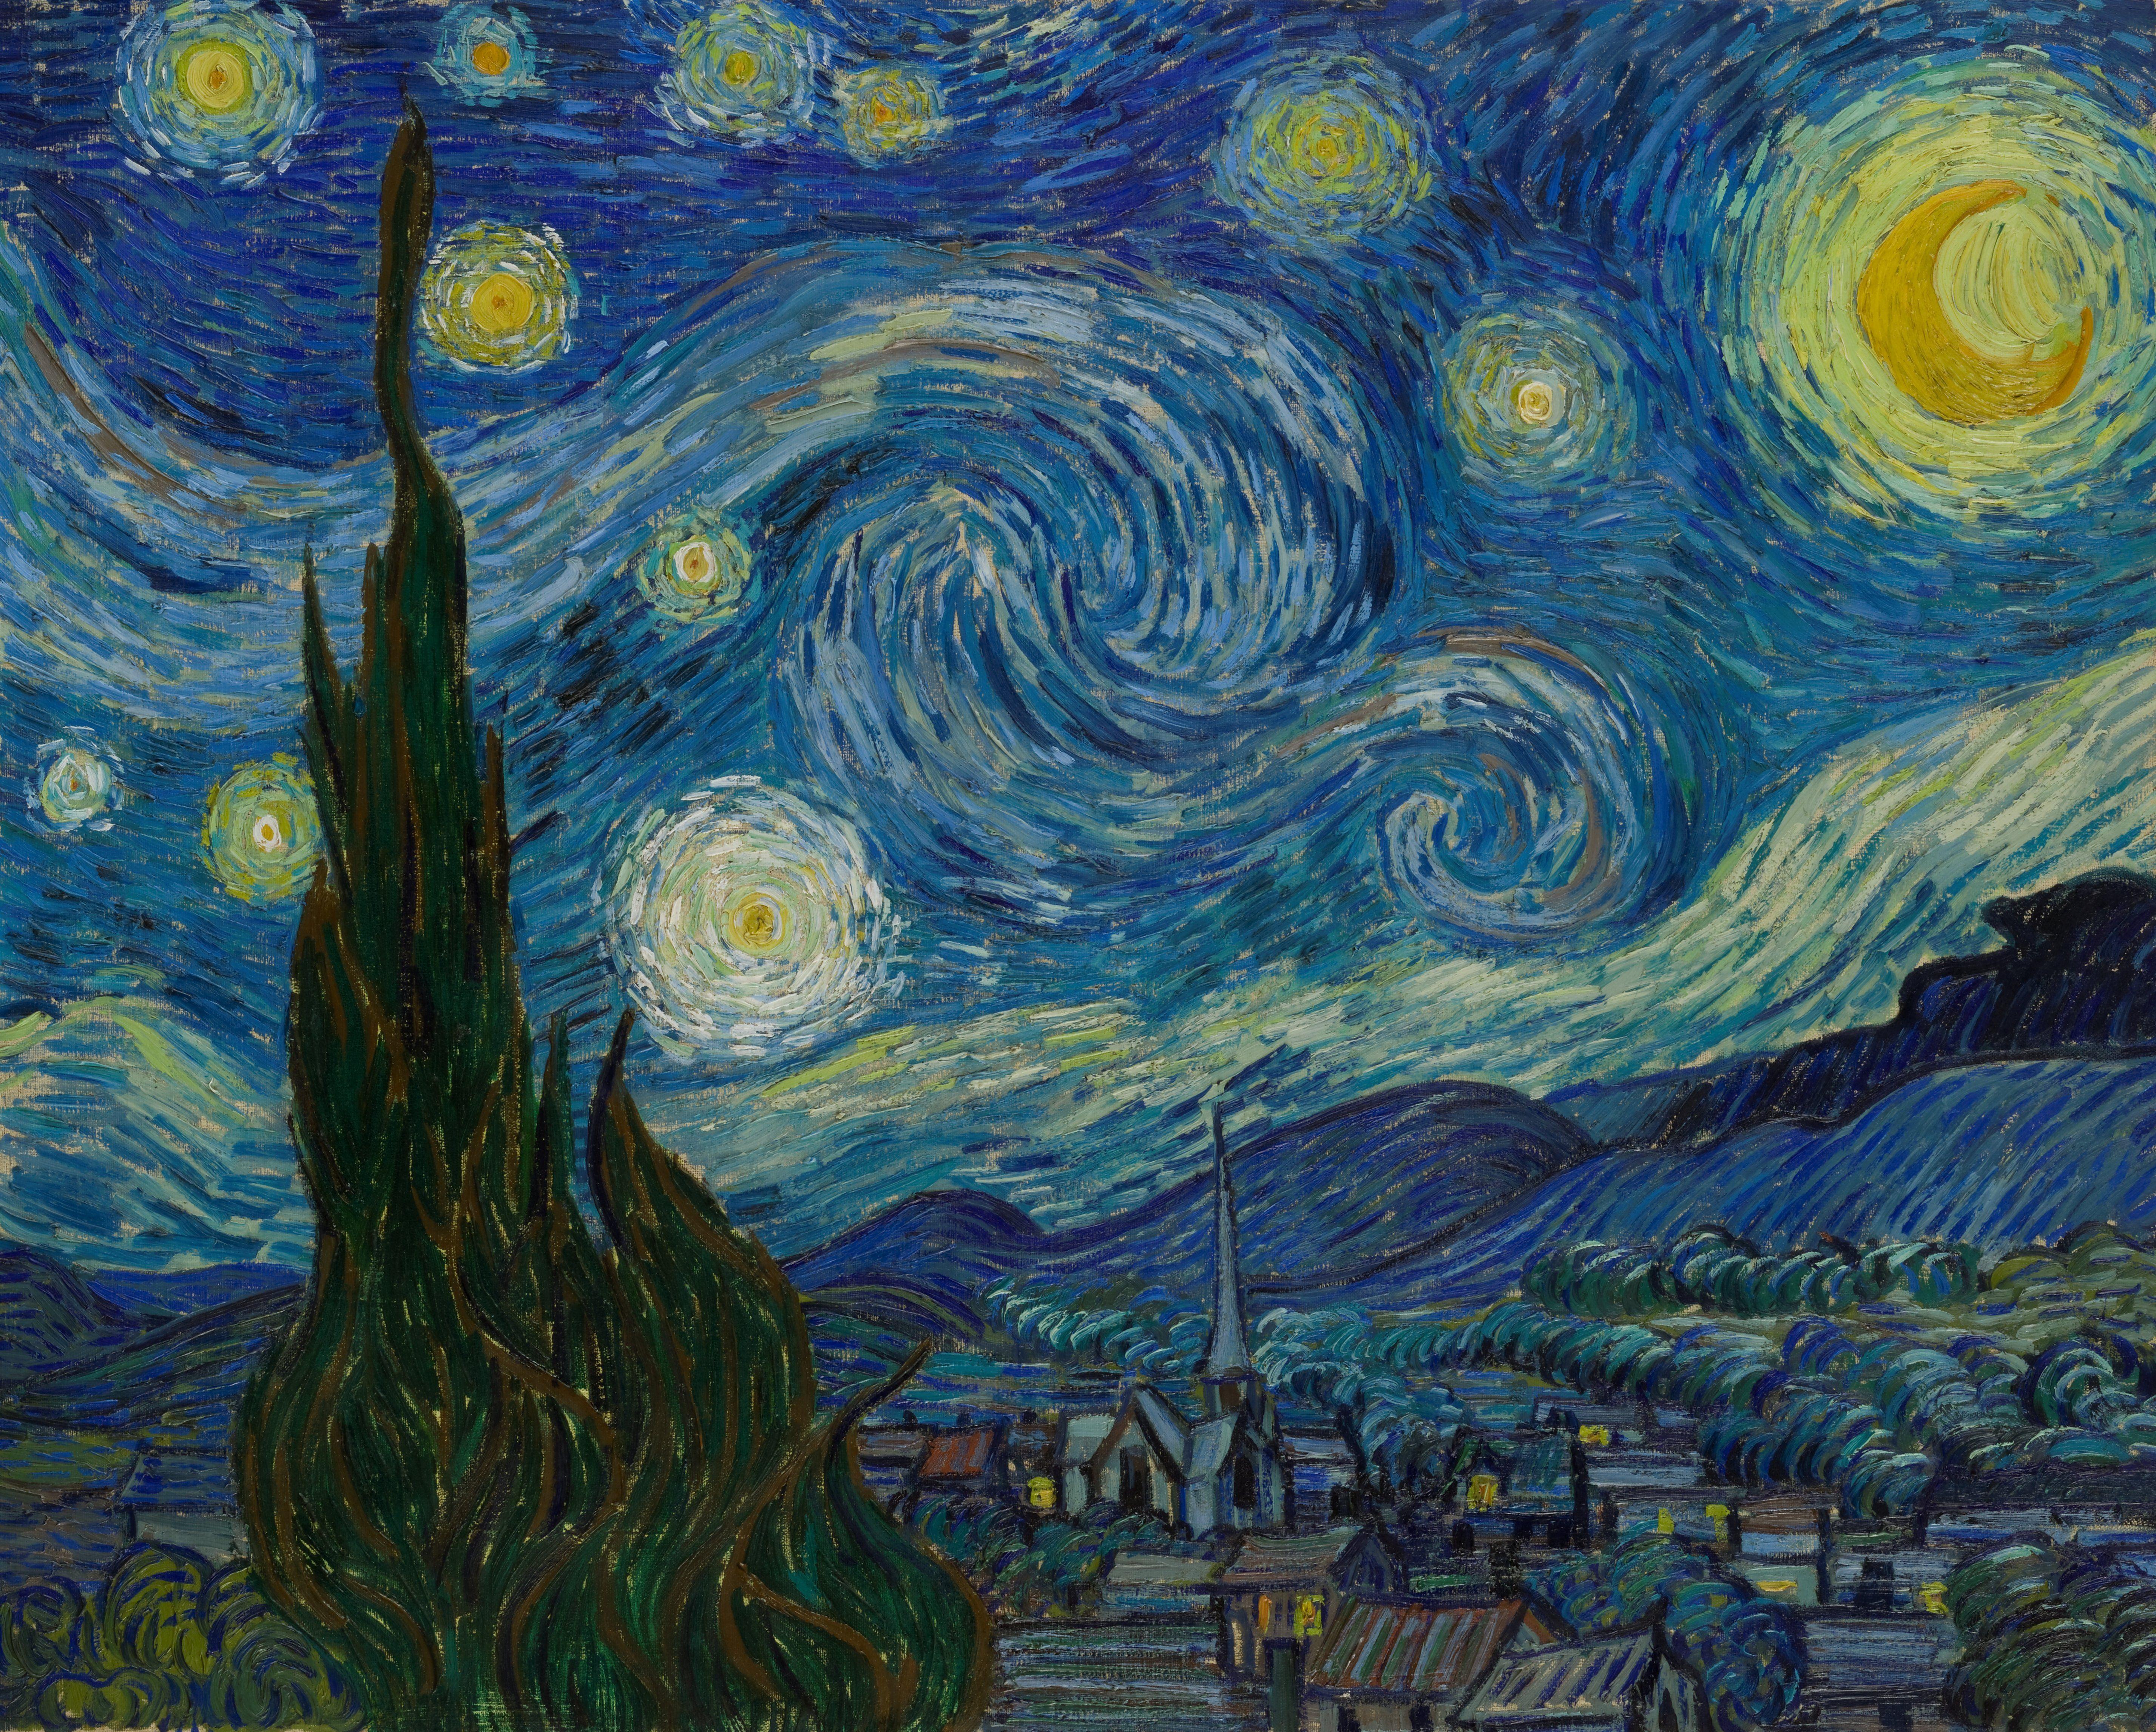 Vincent Van Gogh The Starry Night Starry Night Van Gogh Van Gogh Art Gogh The Starry Night